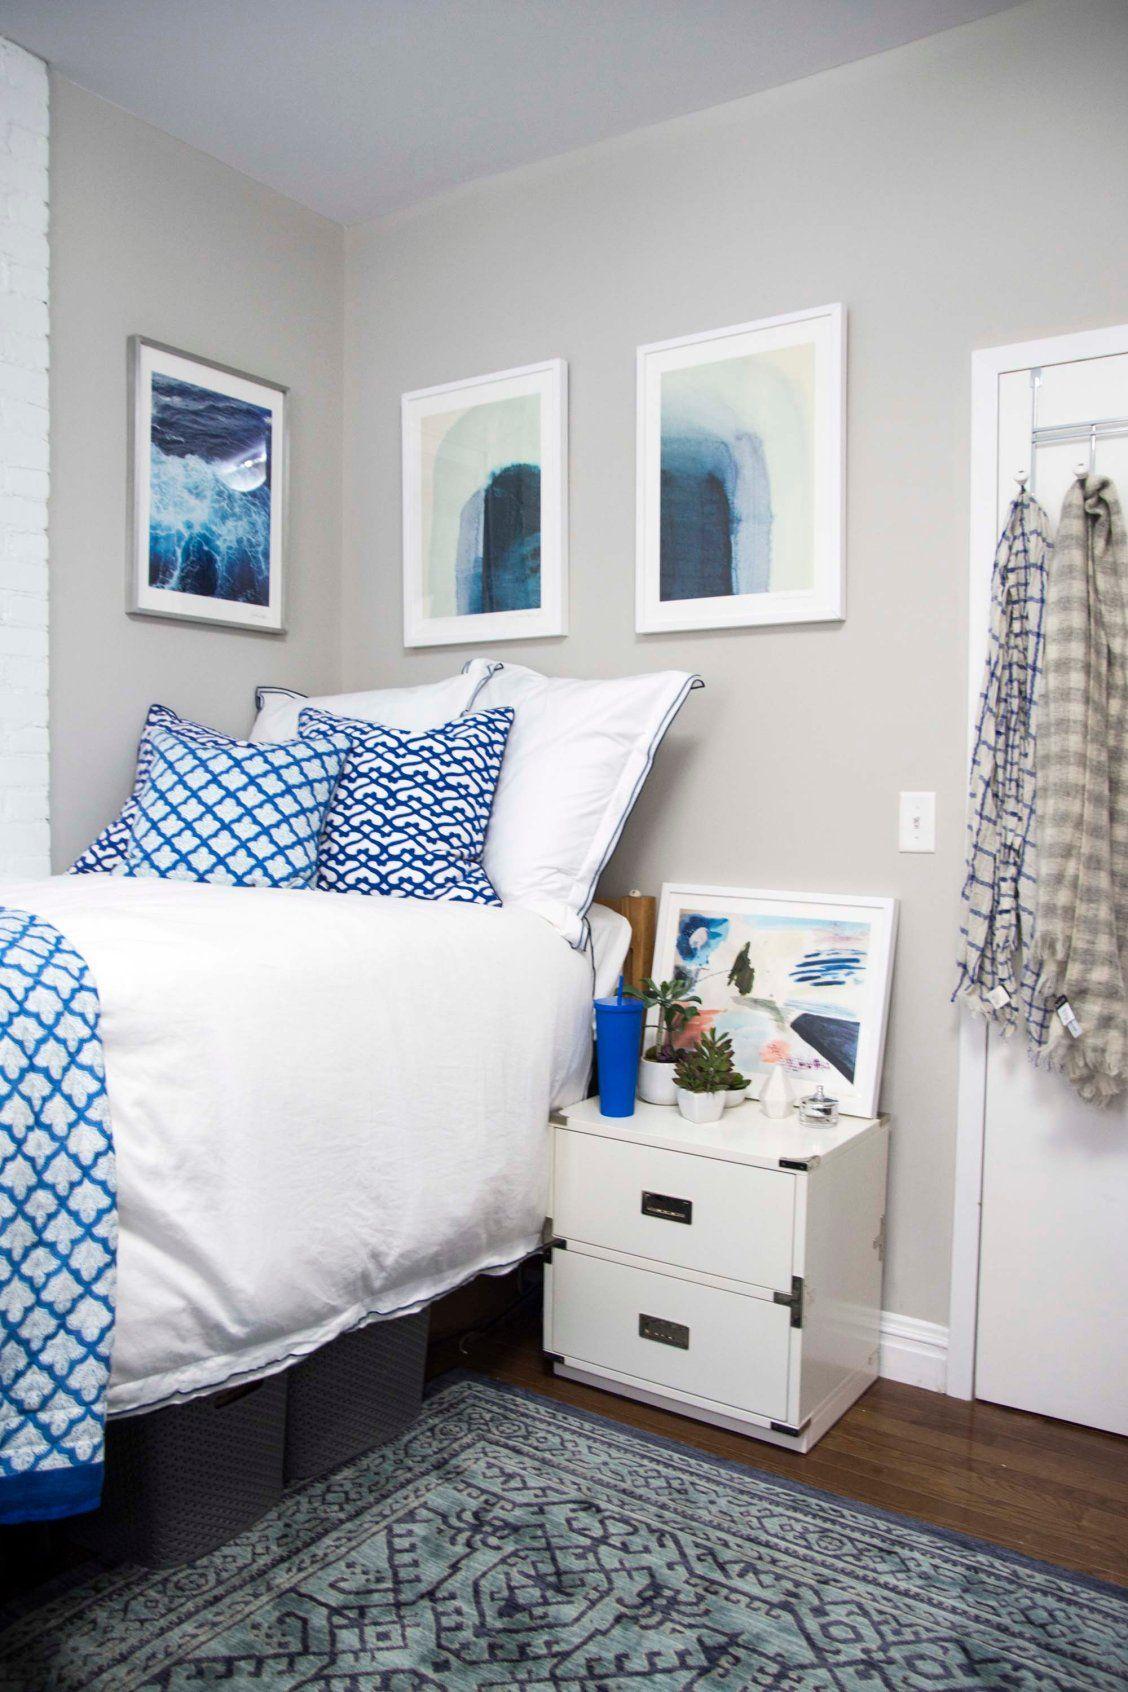 Dorm Room Rugs: The Perfect Area Rug Can Really Make A Dorm Room Feel Like